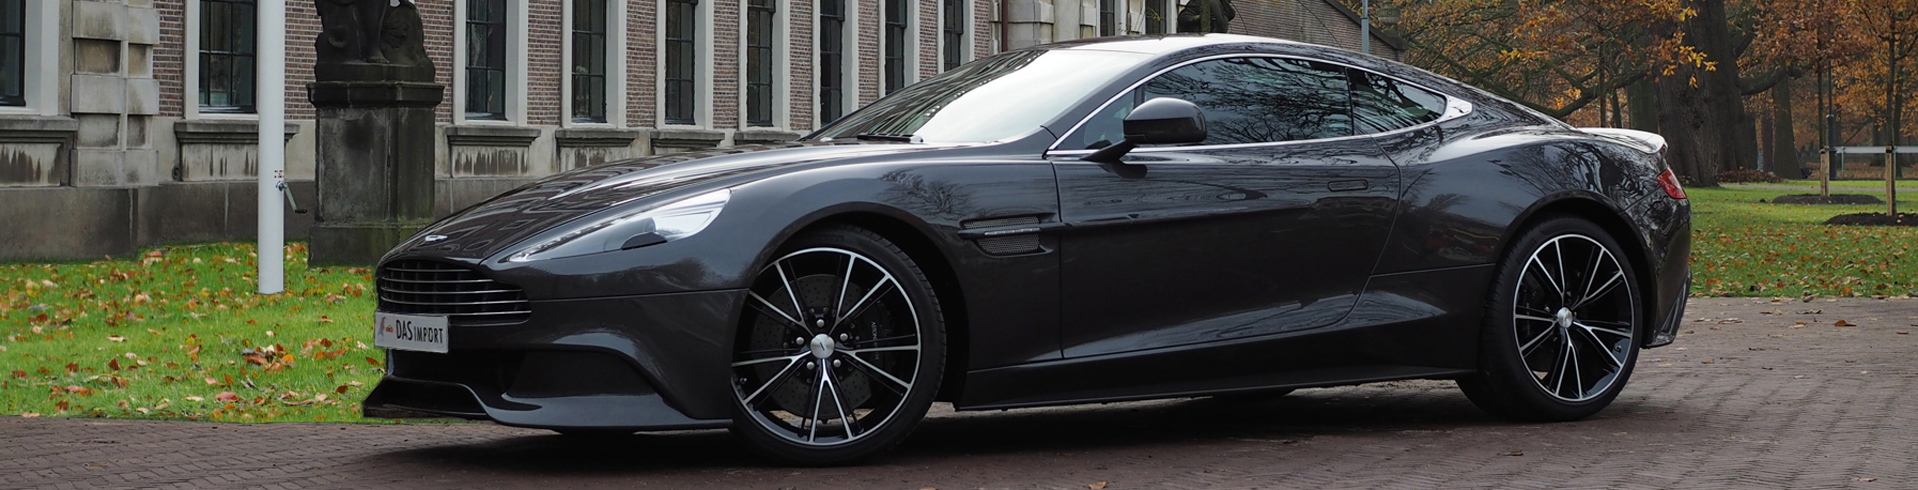 1.-Aston-Martin-Vanquish-20131